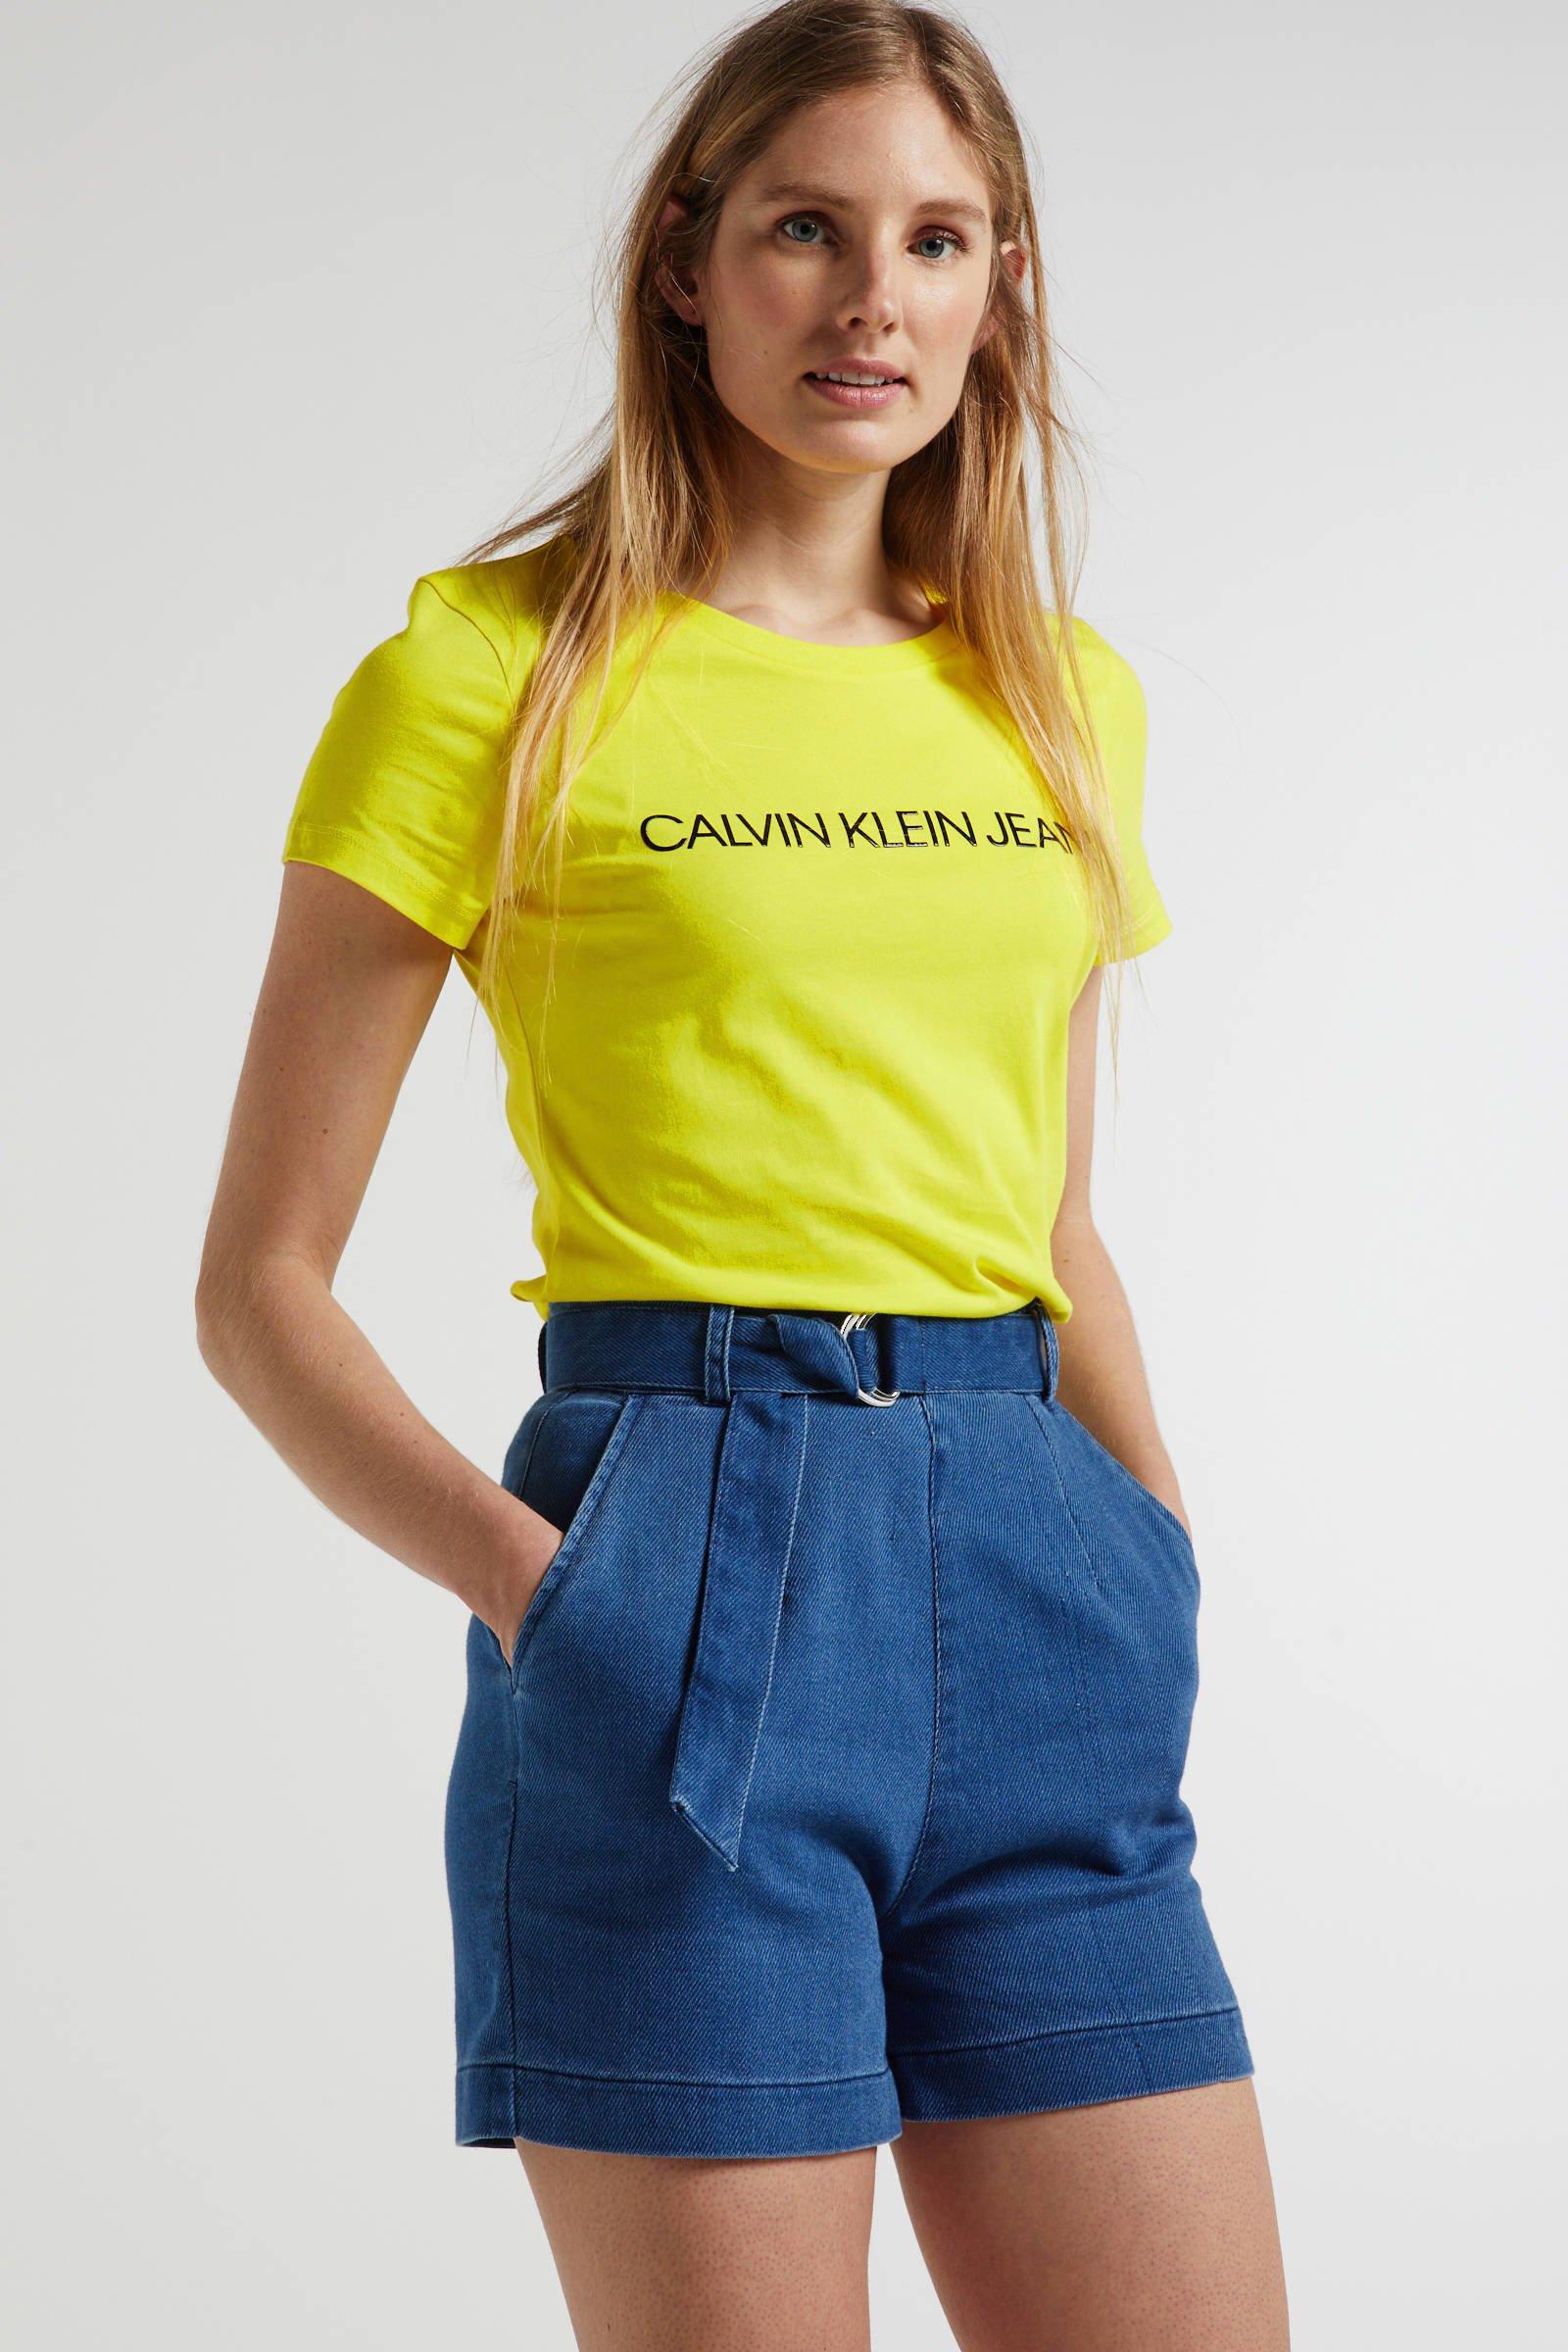 CALVIN KLEIN JEANS T-shirt met logo geel